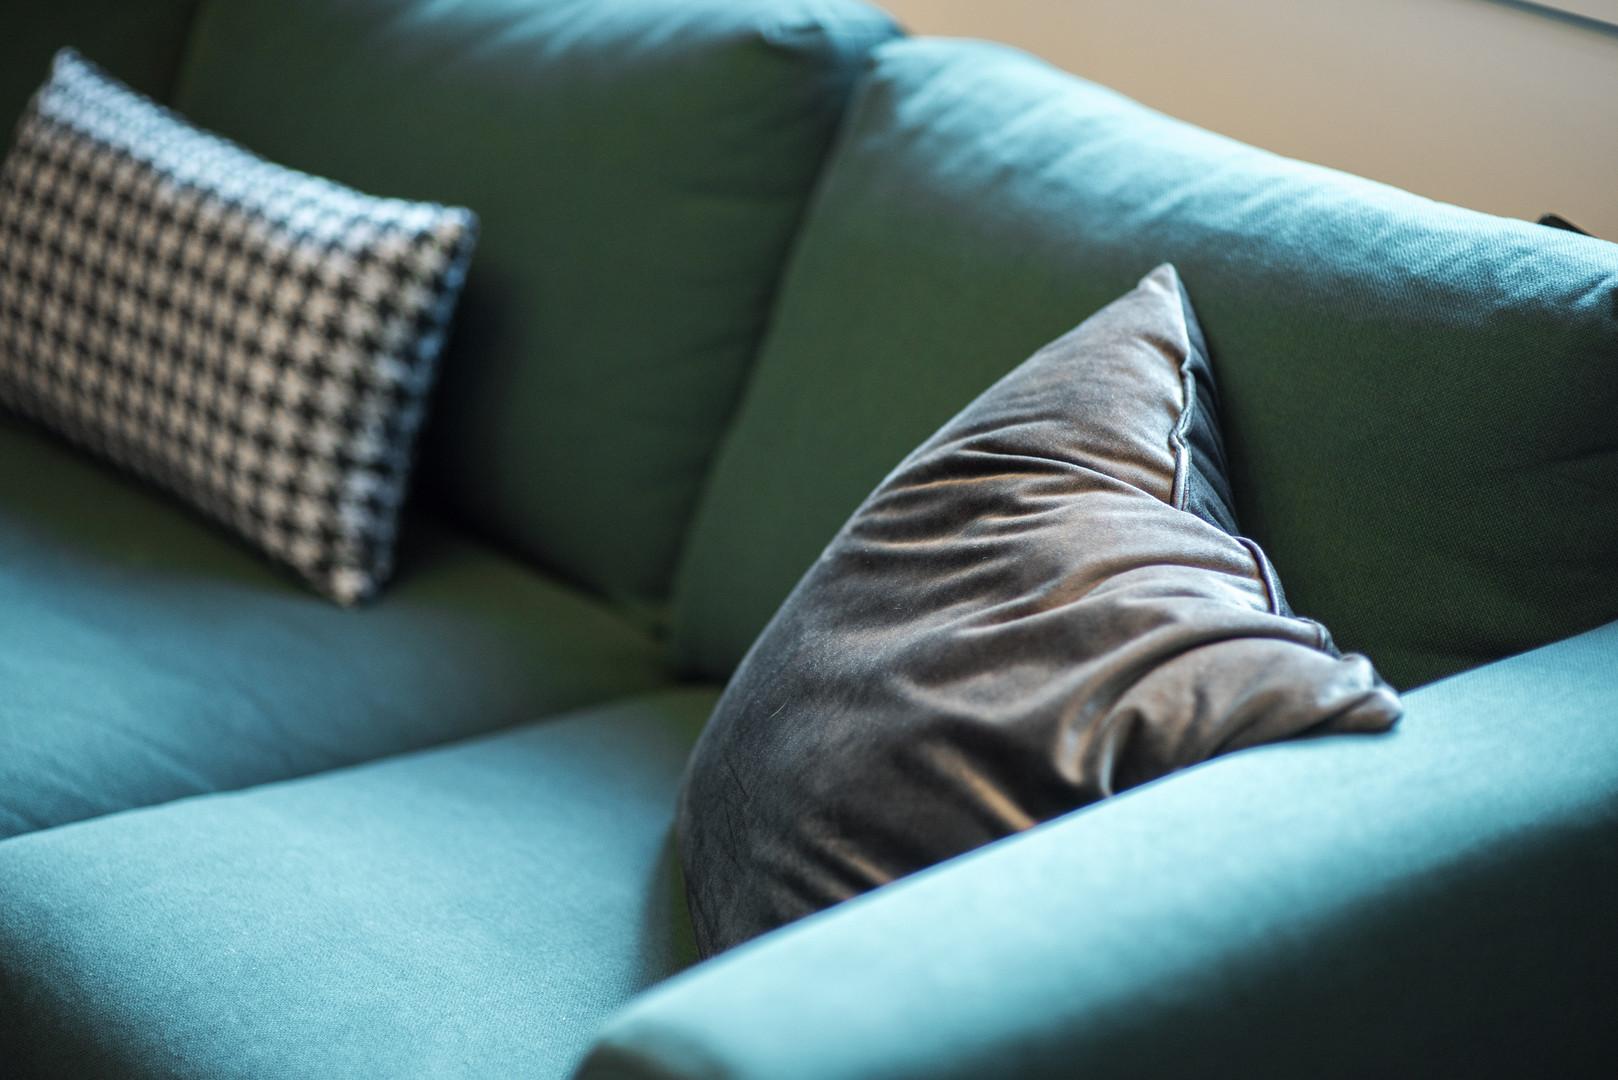 His Office Sofa & Cushions